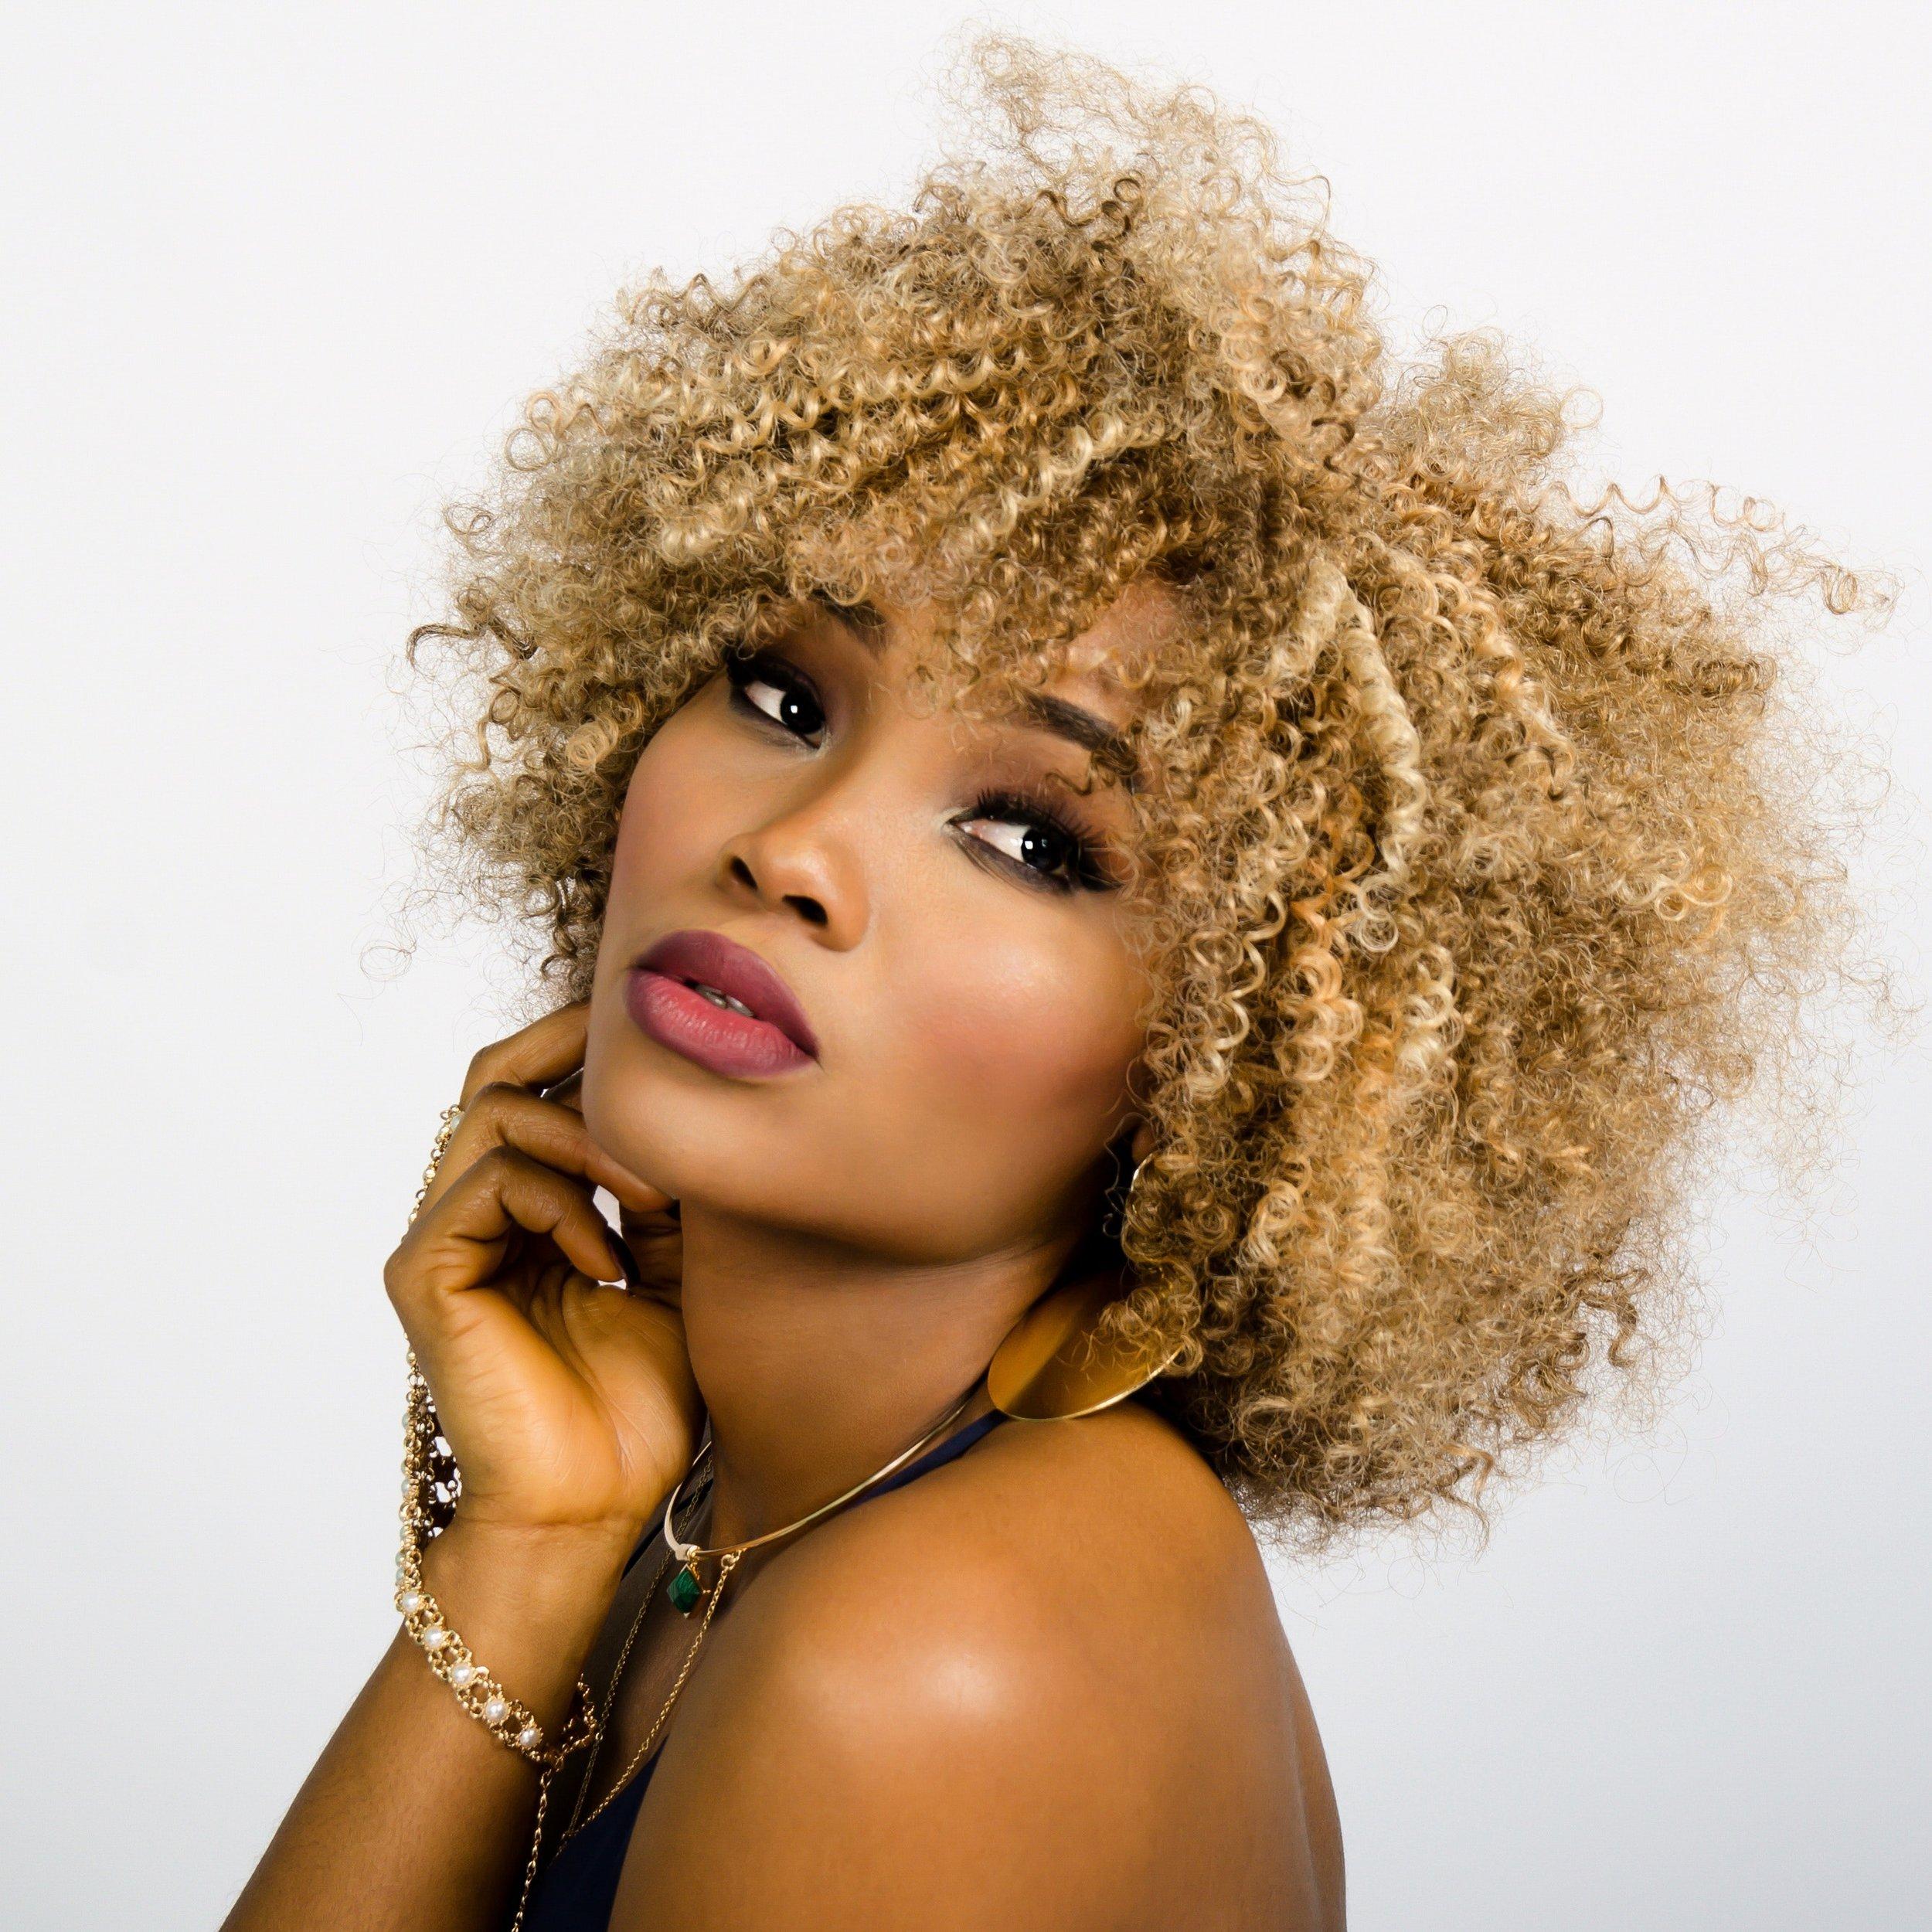 afro-beautiful-curly-157920.jpg